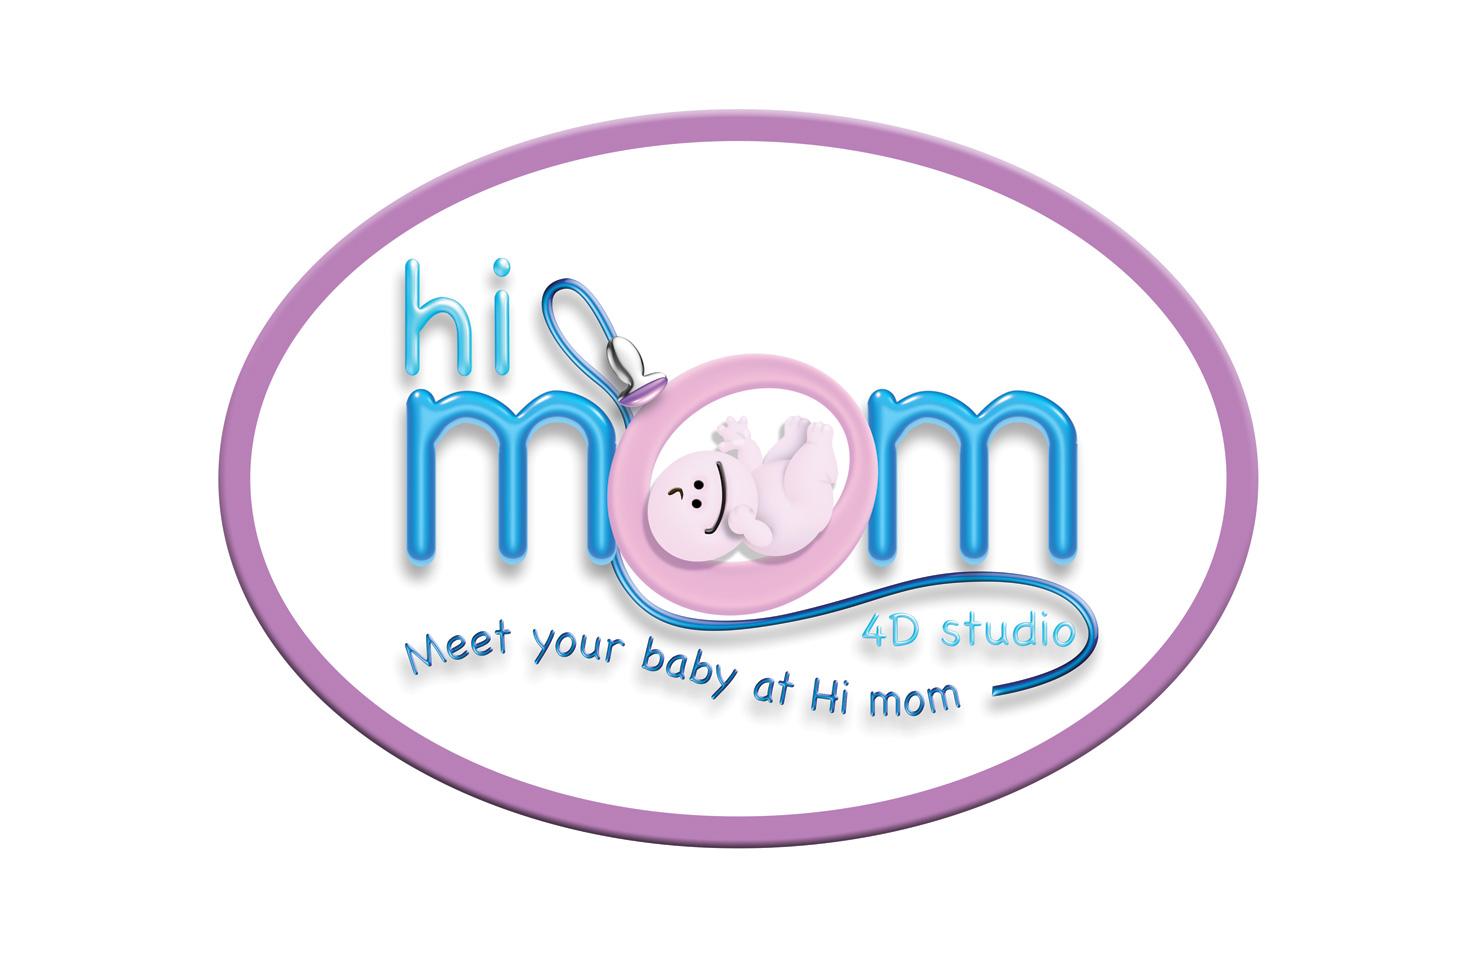 Himom